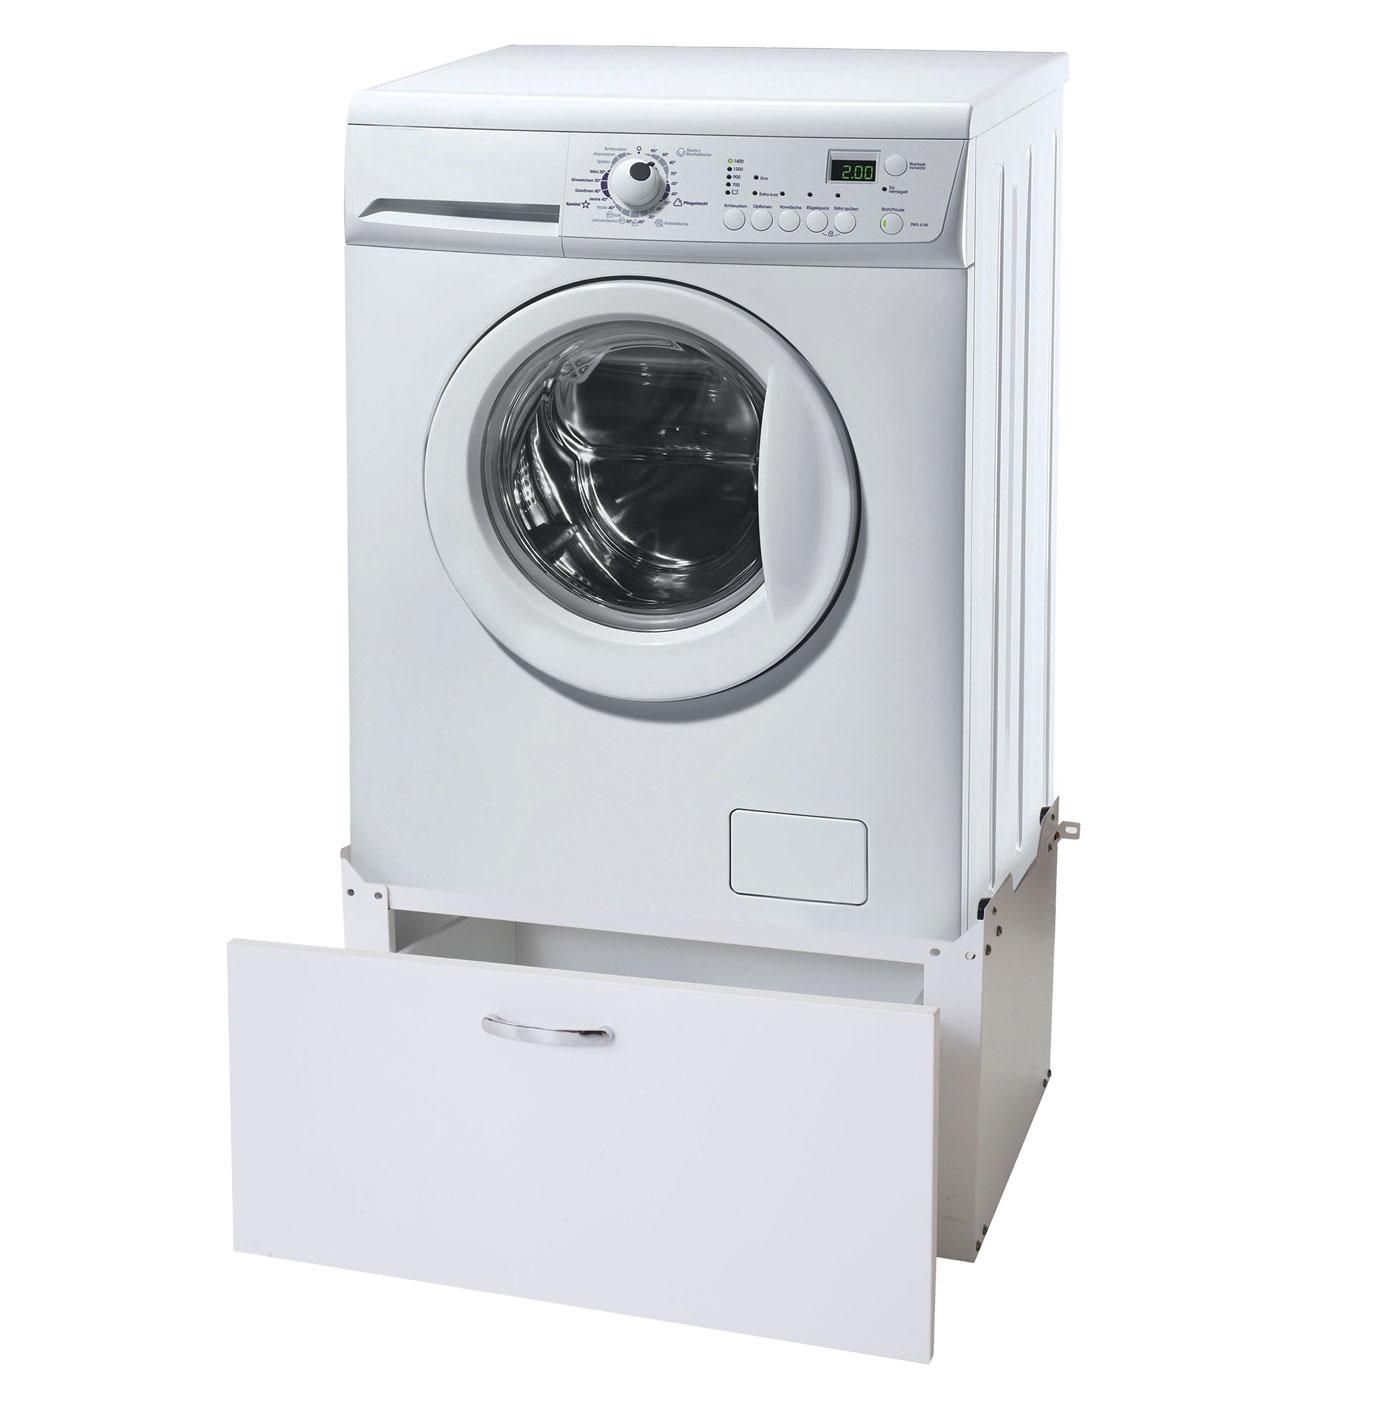 waschmaschinen unterschrank waschmaschinen unterschrank ikea kollektionen ikea schrank. Black Bedroom Furniture Sets. Home Design Ideas